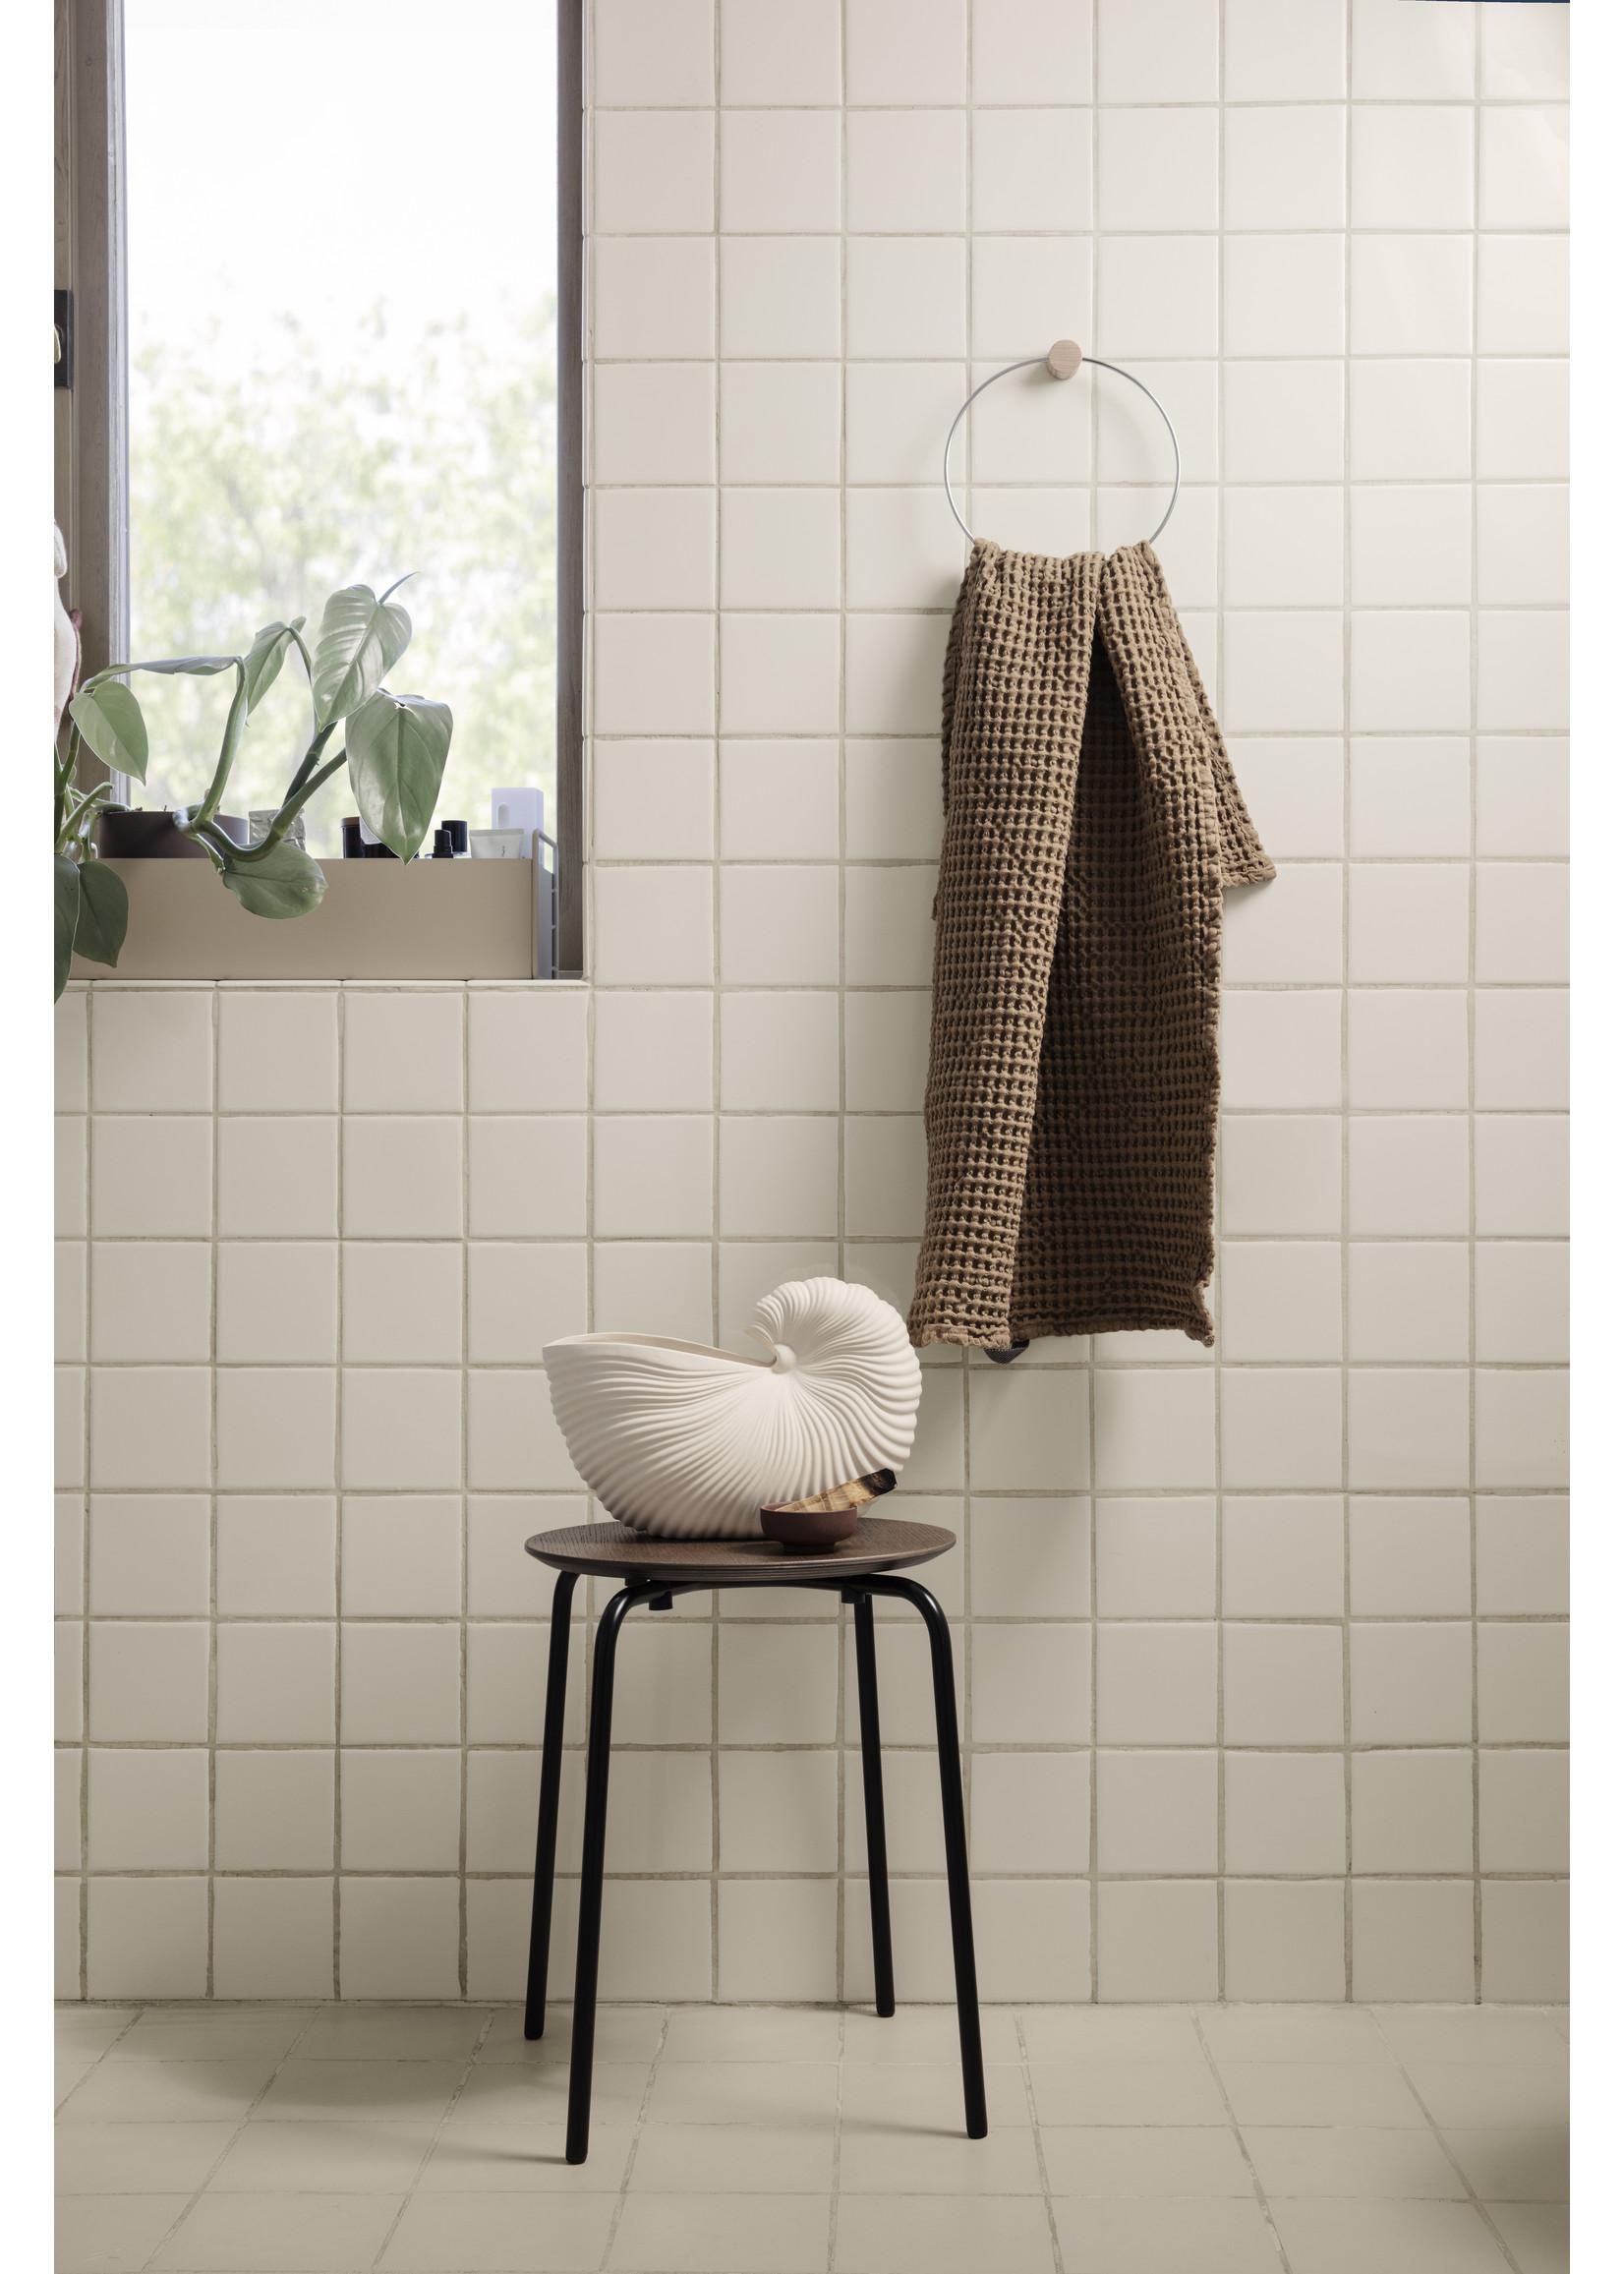 ferm LIVING ferm LIVING Towel Hanger - Chrome